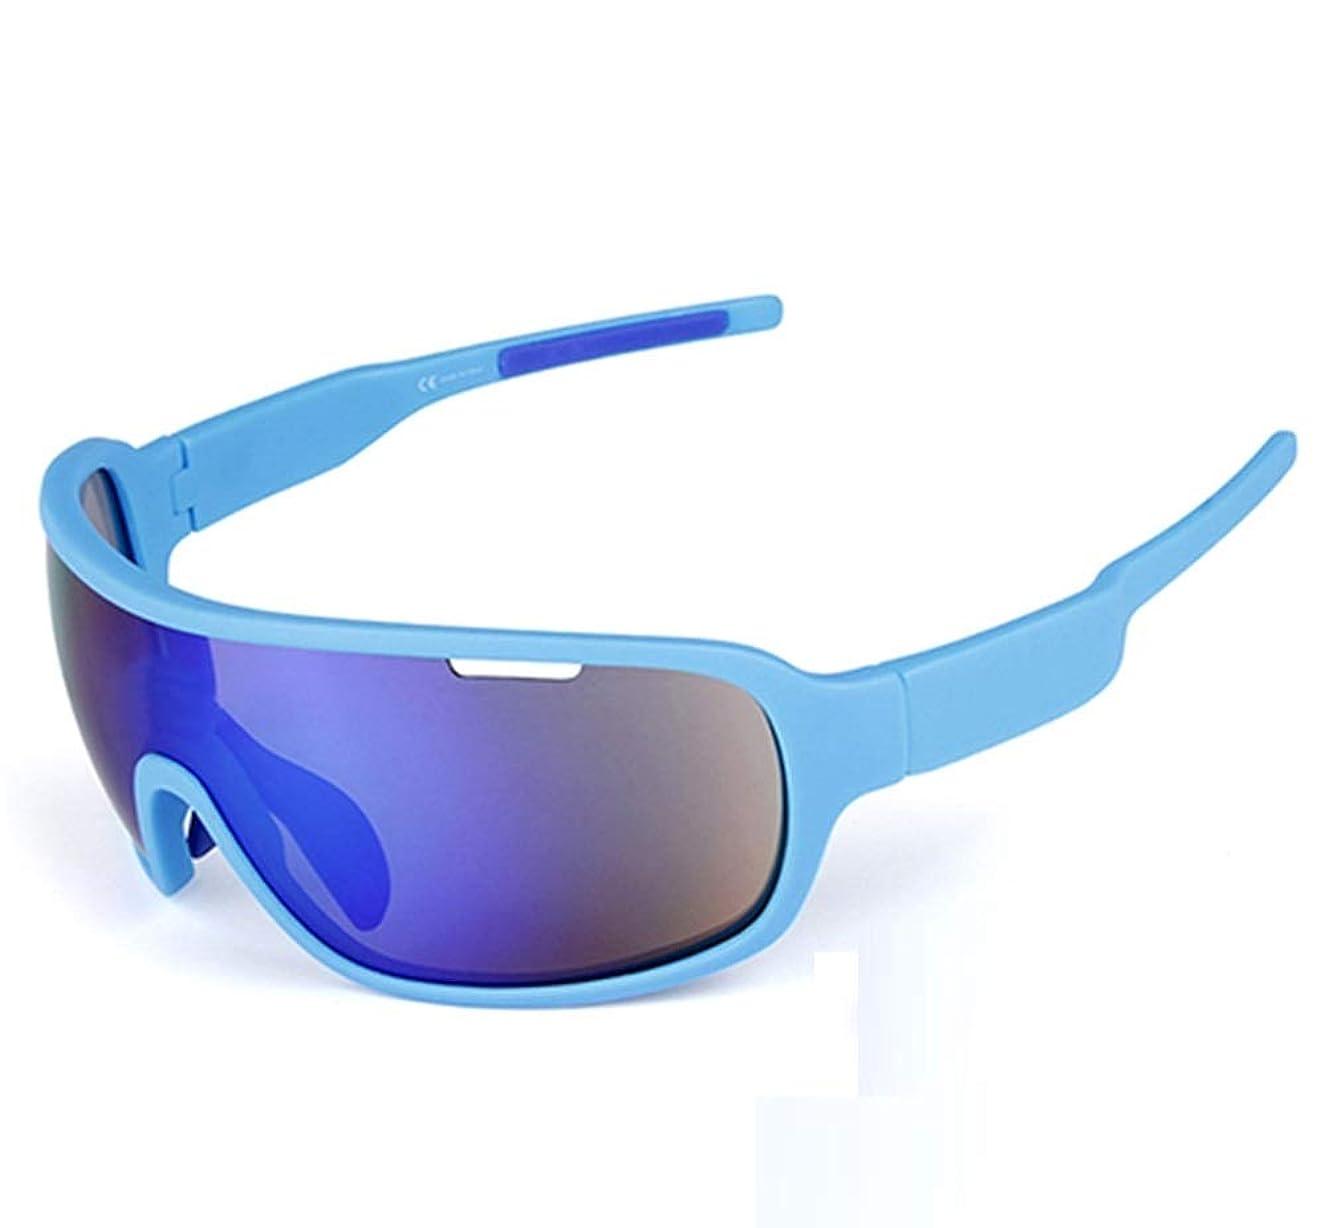 Rungear Polarized Sports Cycling Sunglasses Bike Glasses for Men Women Running Driving Fishing Golf Baseball Racing Ski Goggles